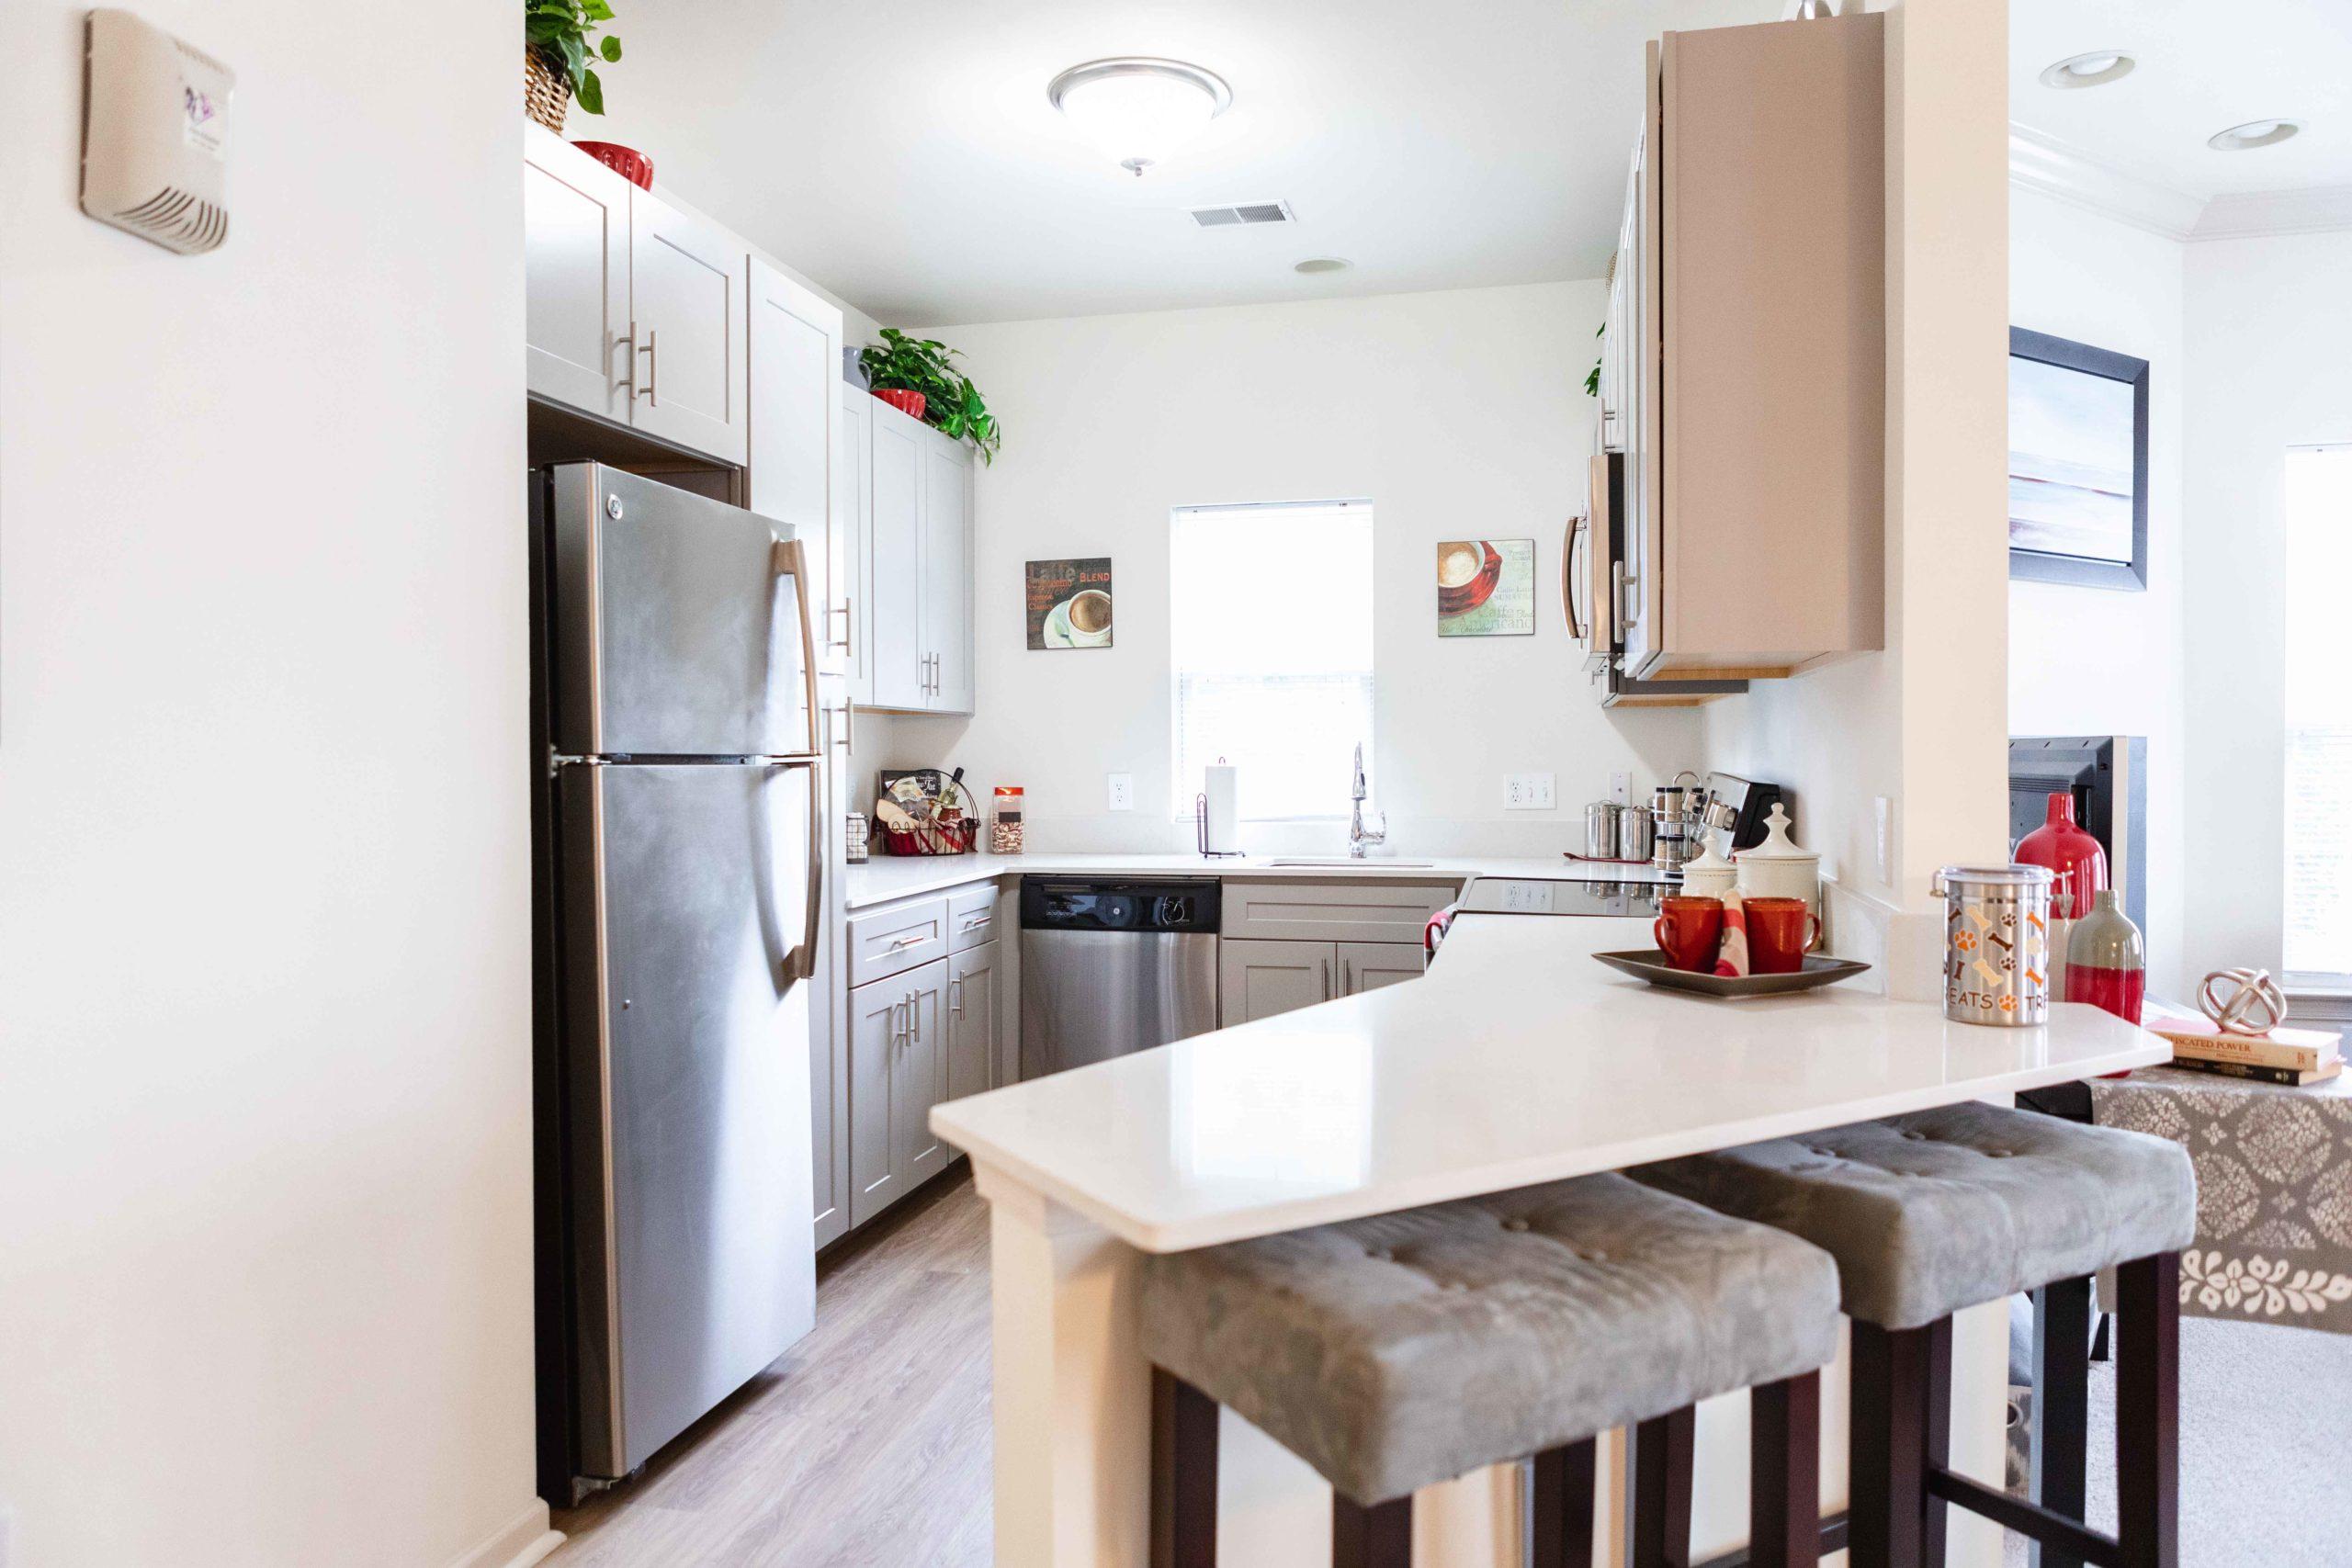 Saucon View - Kitchen & Living Room